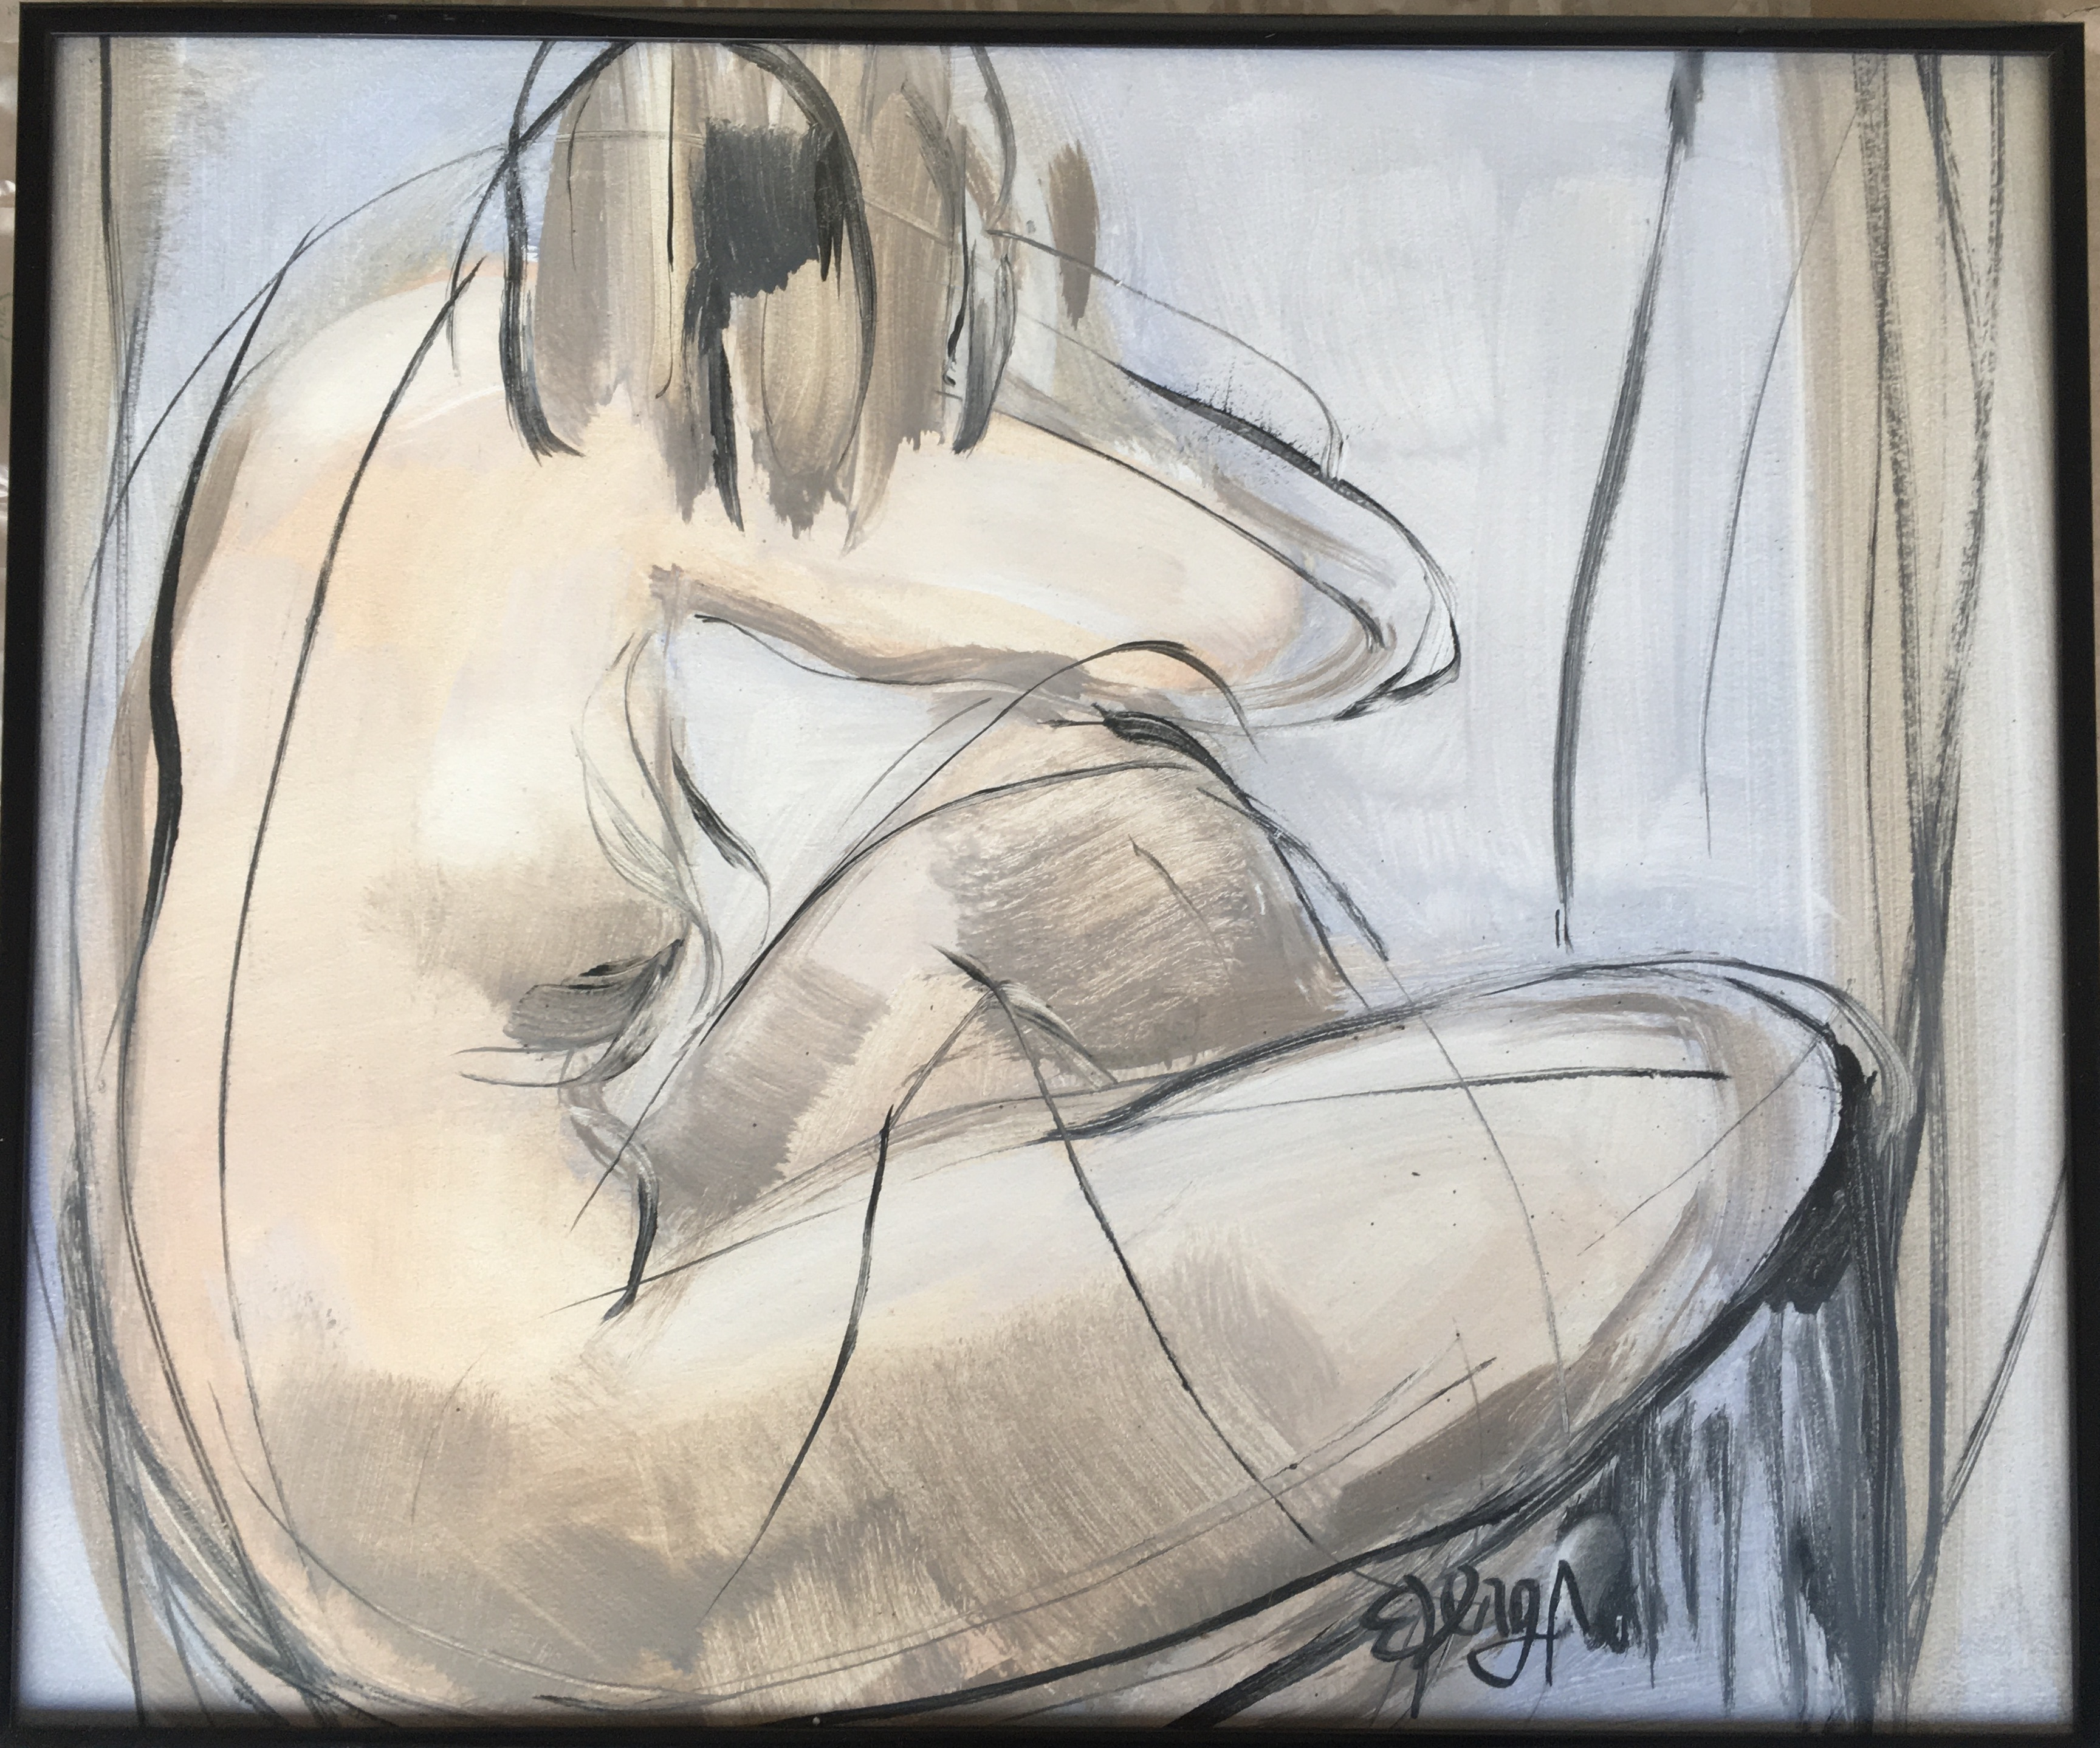 Galerie d'image - Galerie Mona Berga